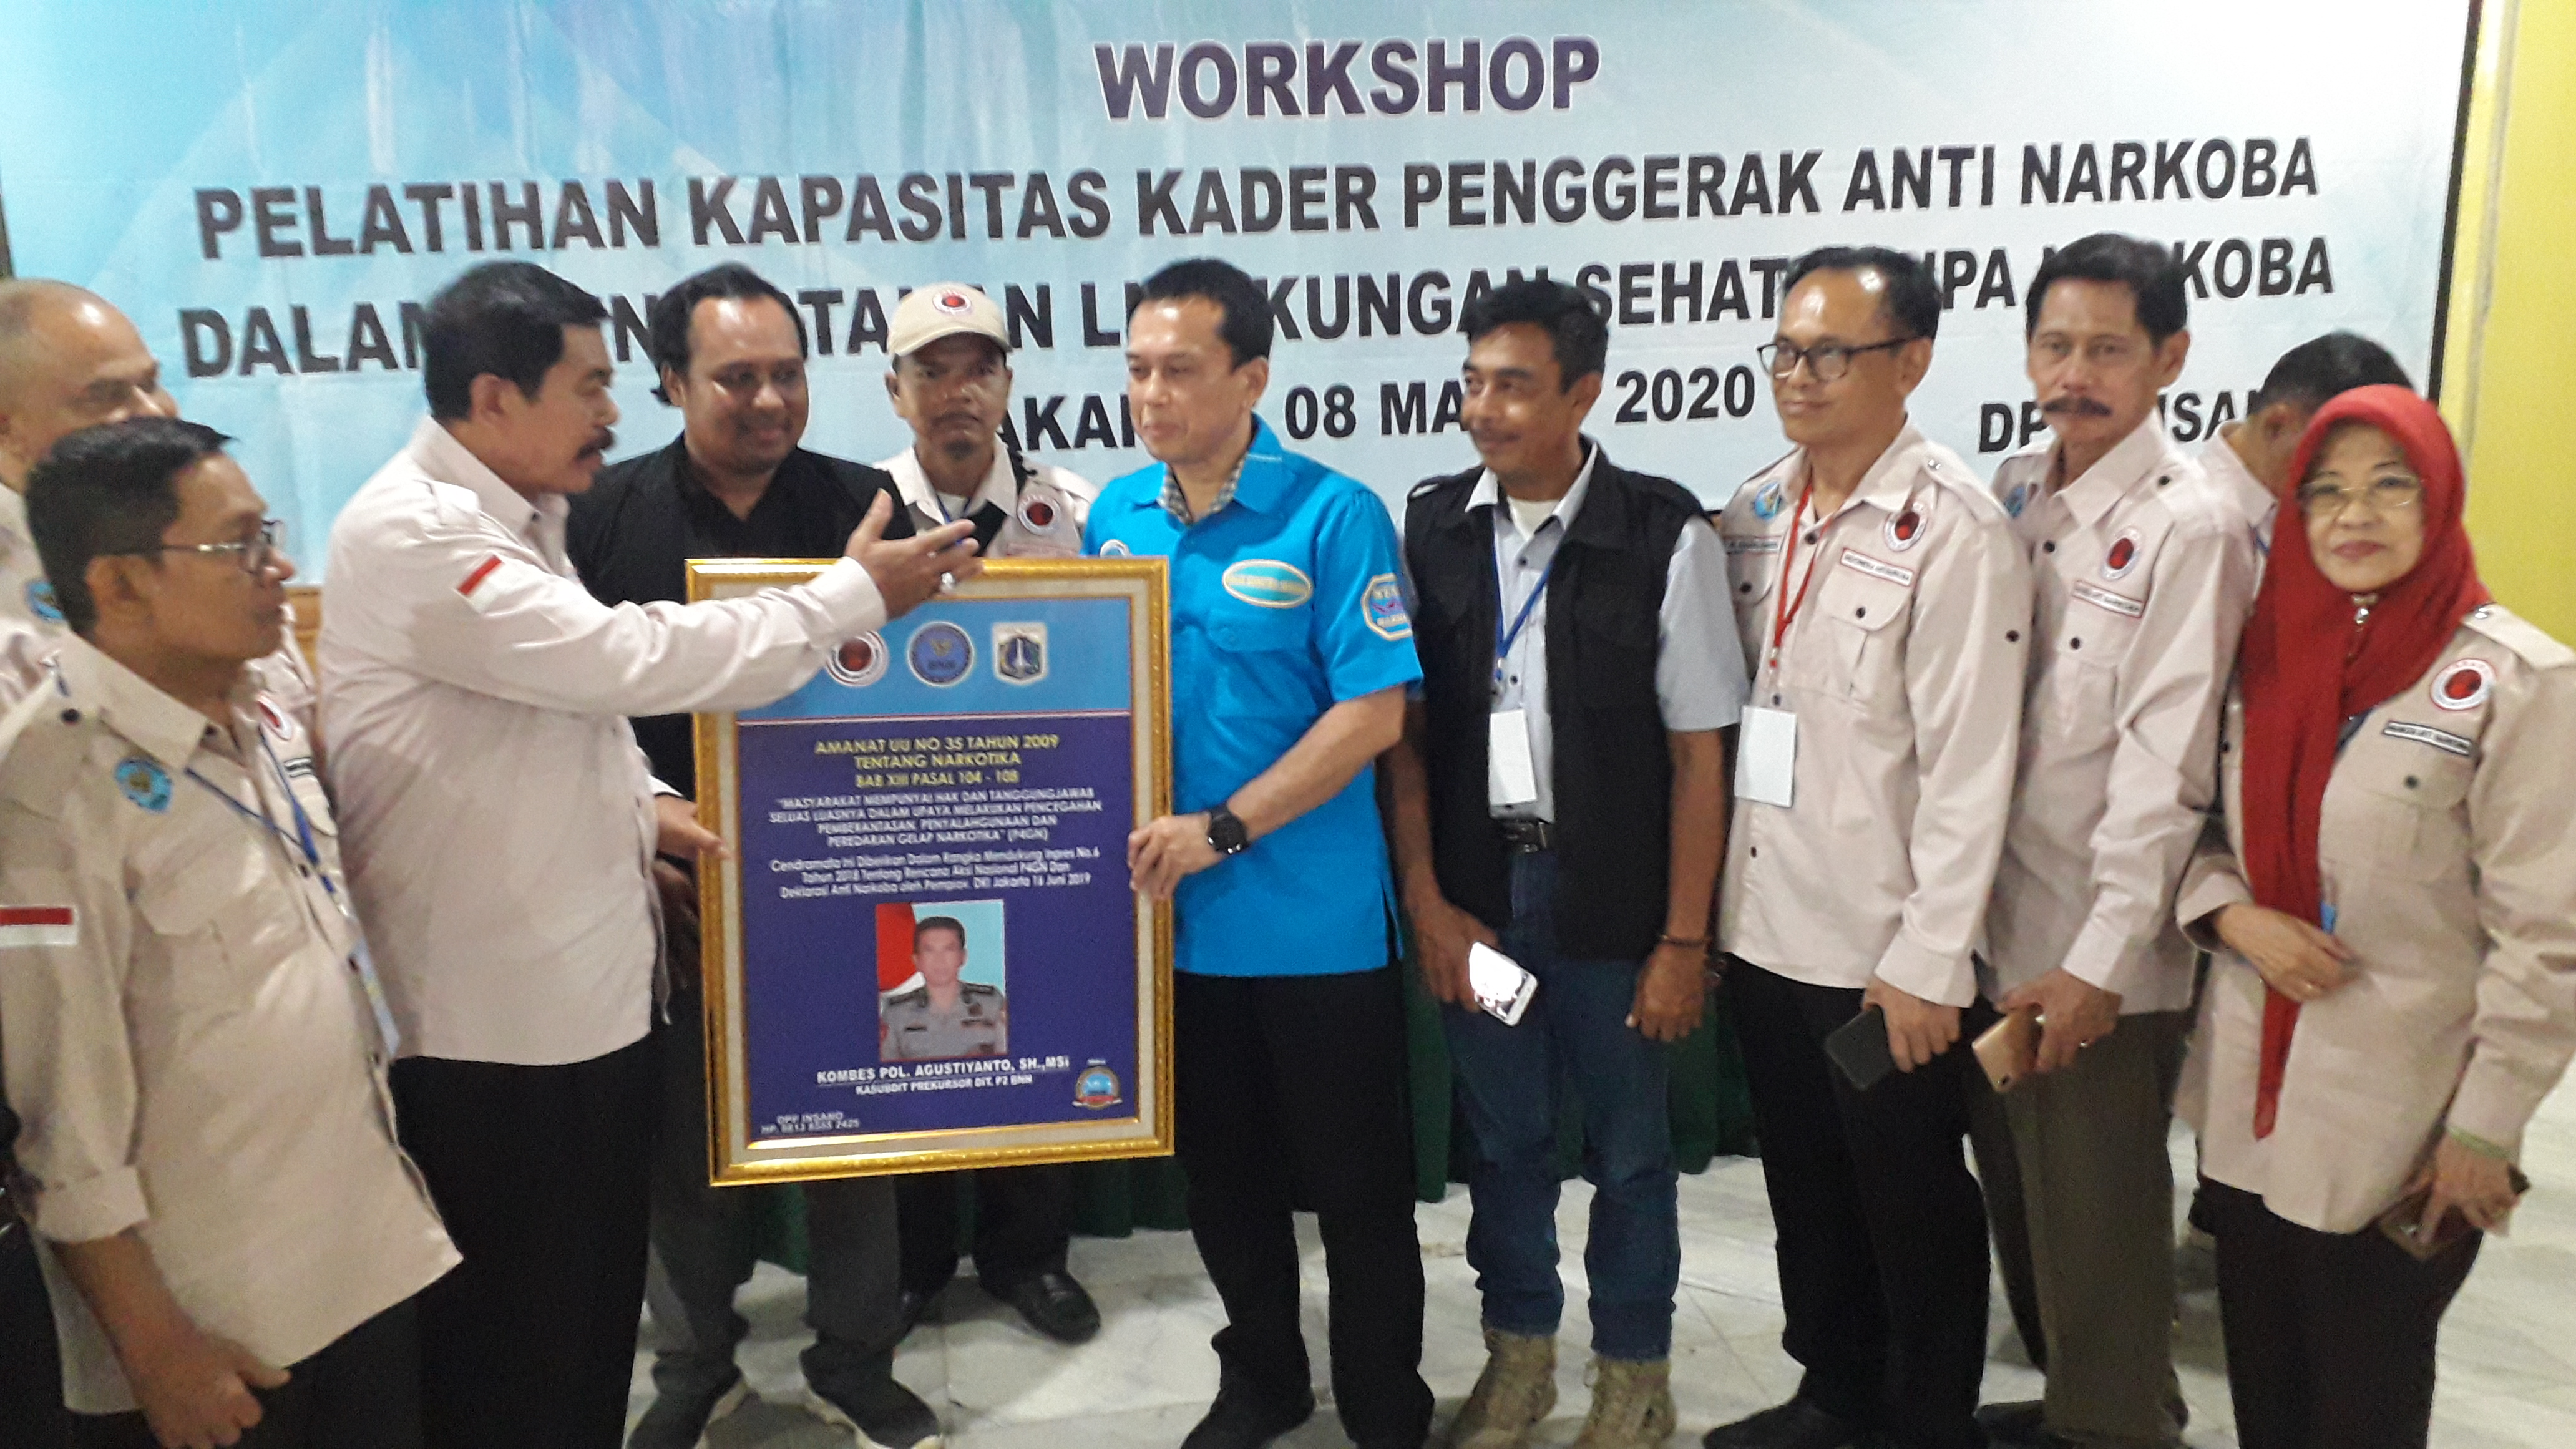 Siapkan 3000 RW Kader Anti Narkoba se-DKI Jakarta, INSANO Dan BNN Gelar TOT